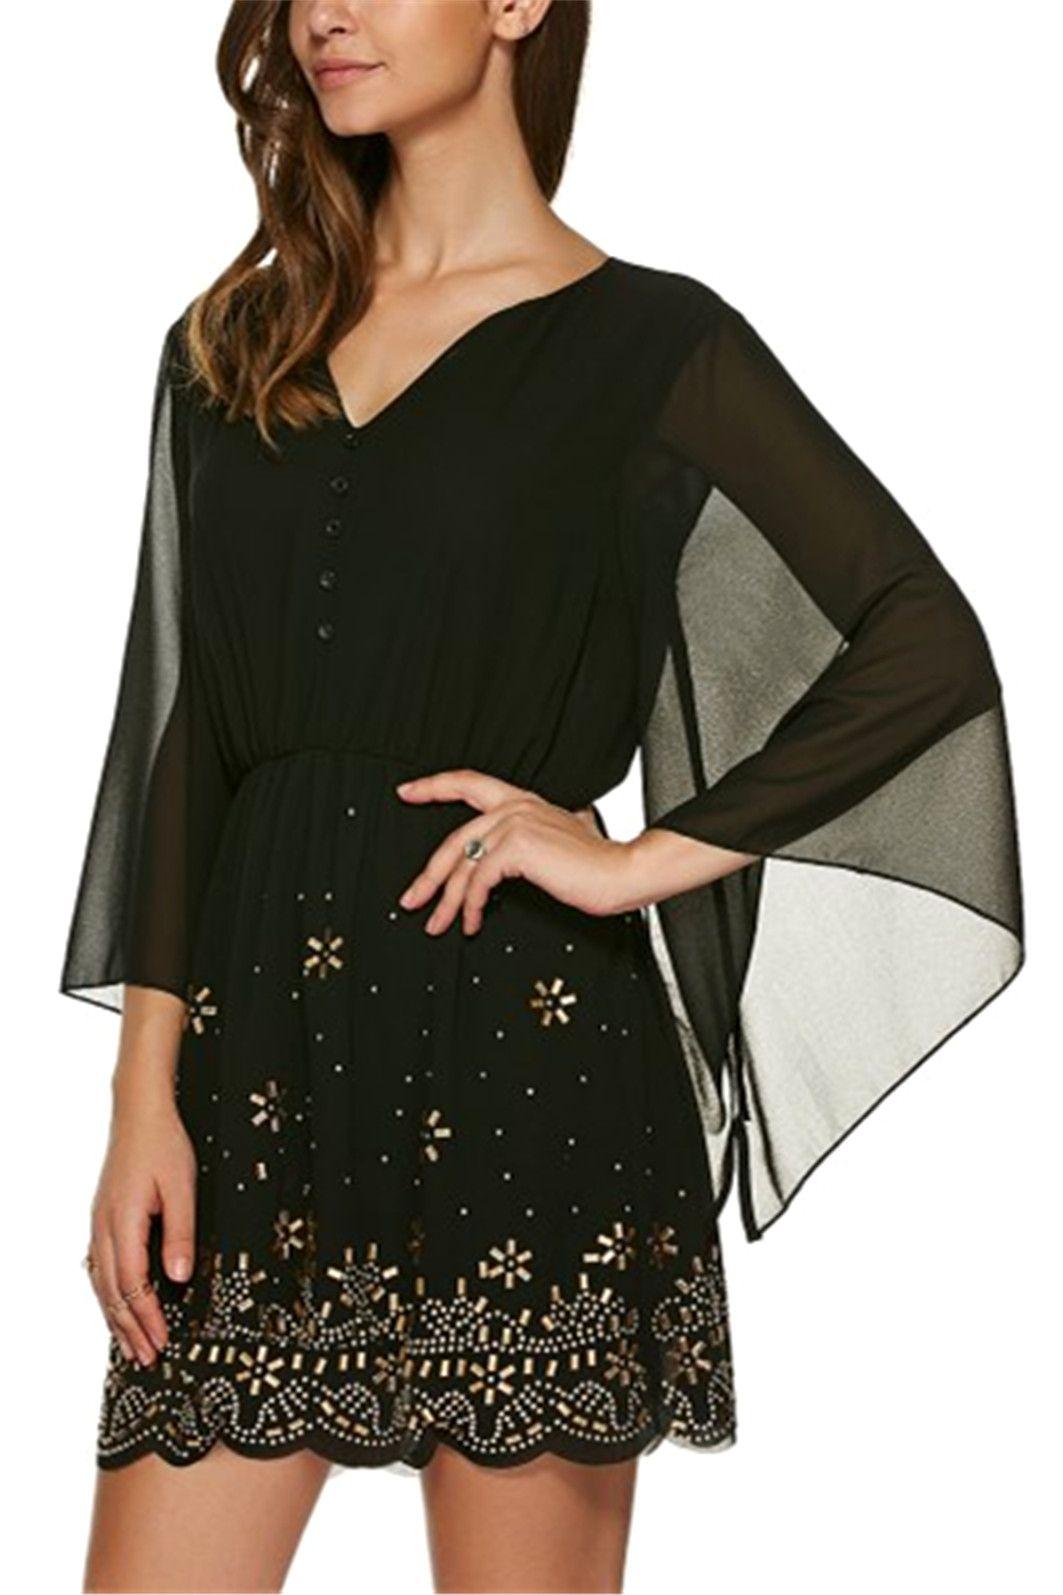 V neck sleeve rhinestone dress black xl sleeved dress